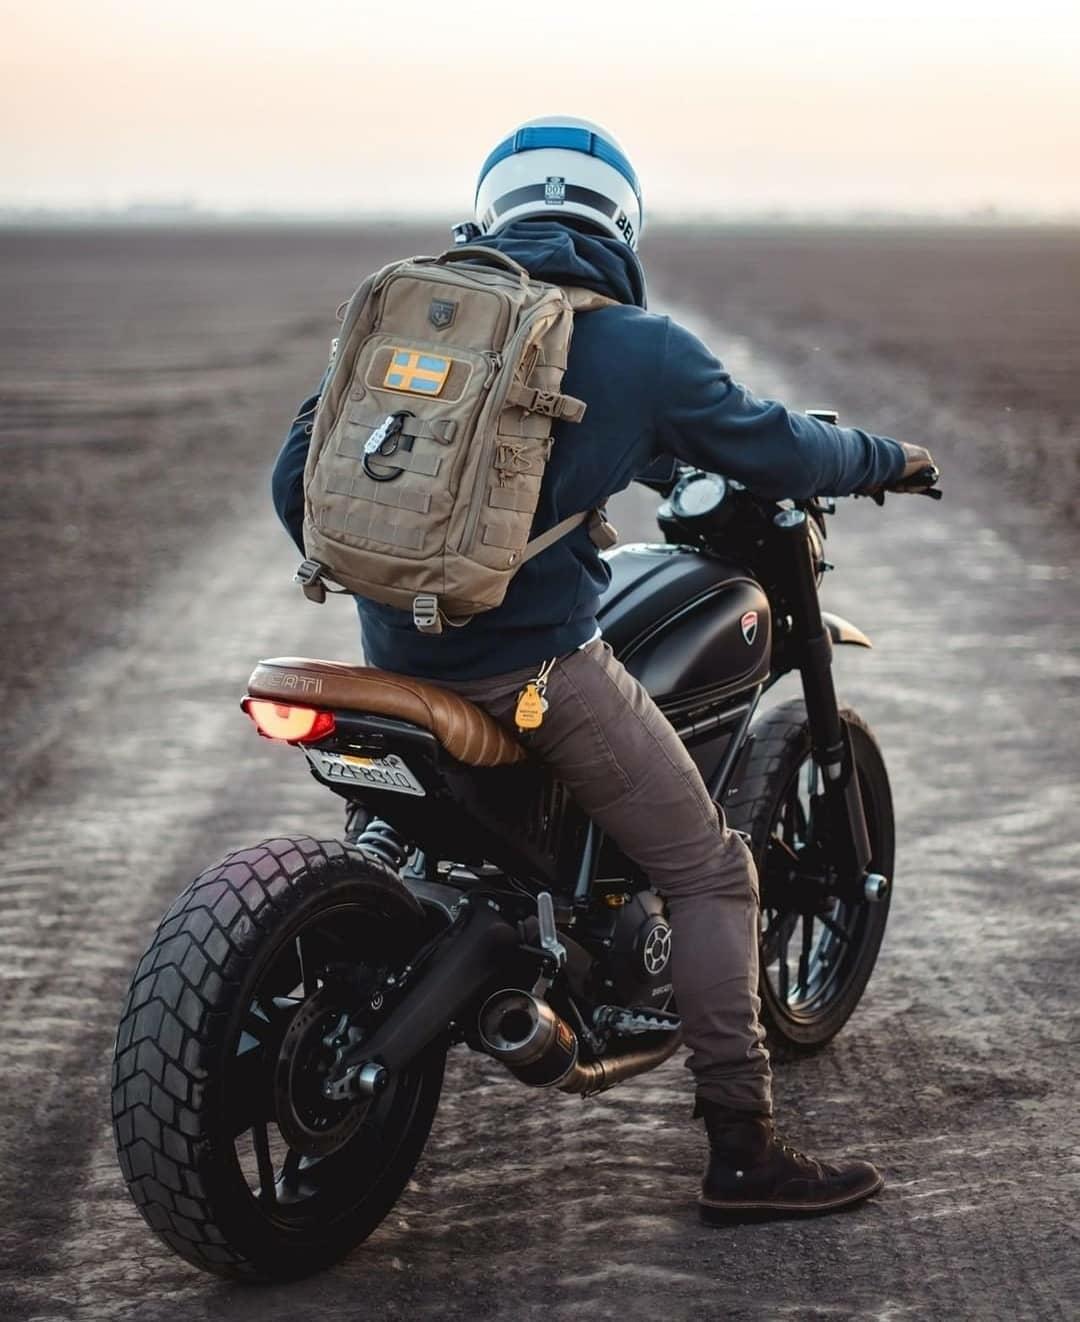 man on motorcycle scramblin